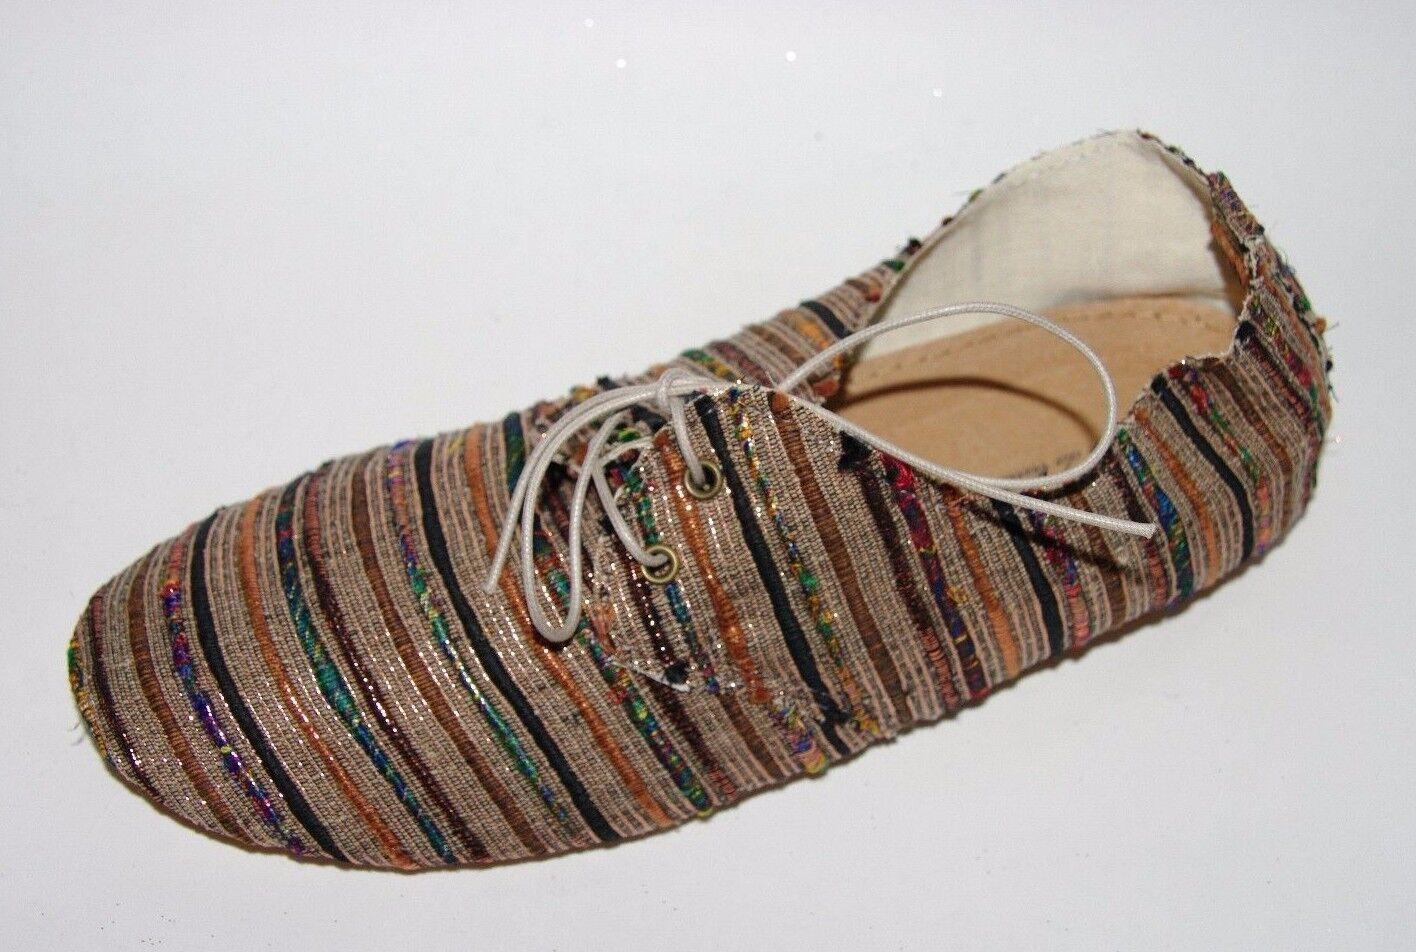 NEU 110 Anniel Ballet Derby Schuhes  8US/38EU